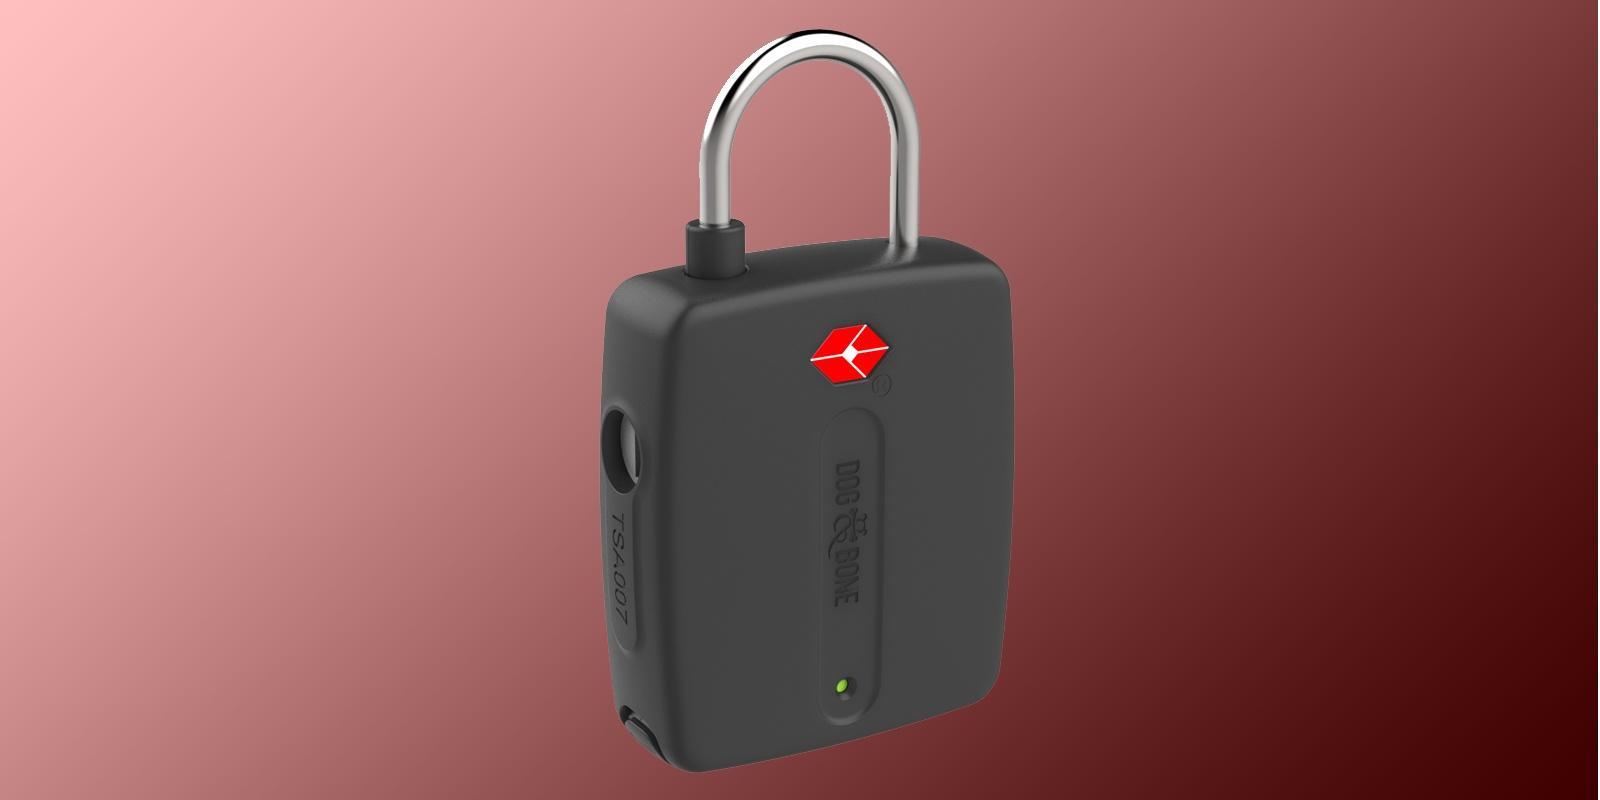 bluetooth-luggage-lock-will-keep-the-tsa-out-of-your-pants-image-cultofandroidcomwp-contentuploads201601Dog-and-Bone-LockSmart-Travel-CES-2016-jpg